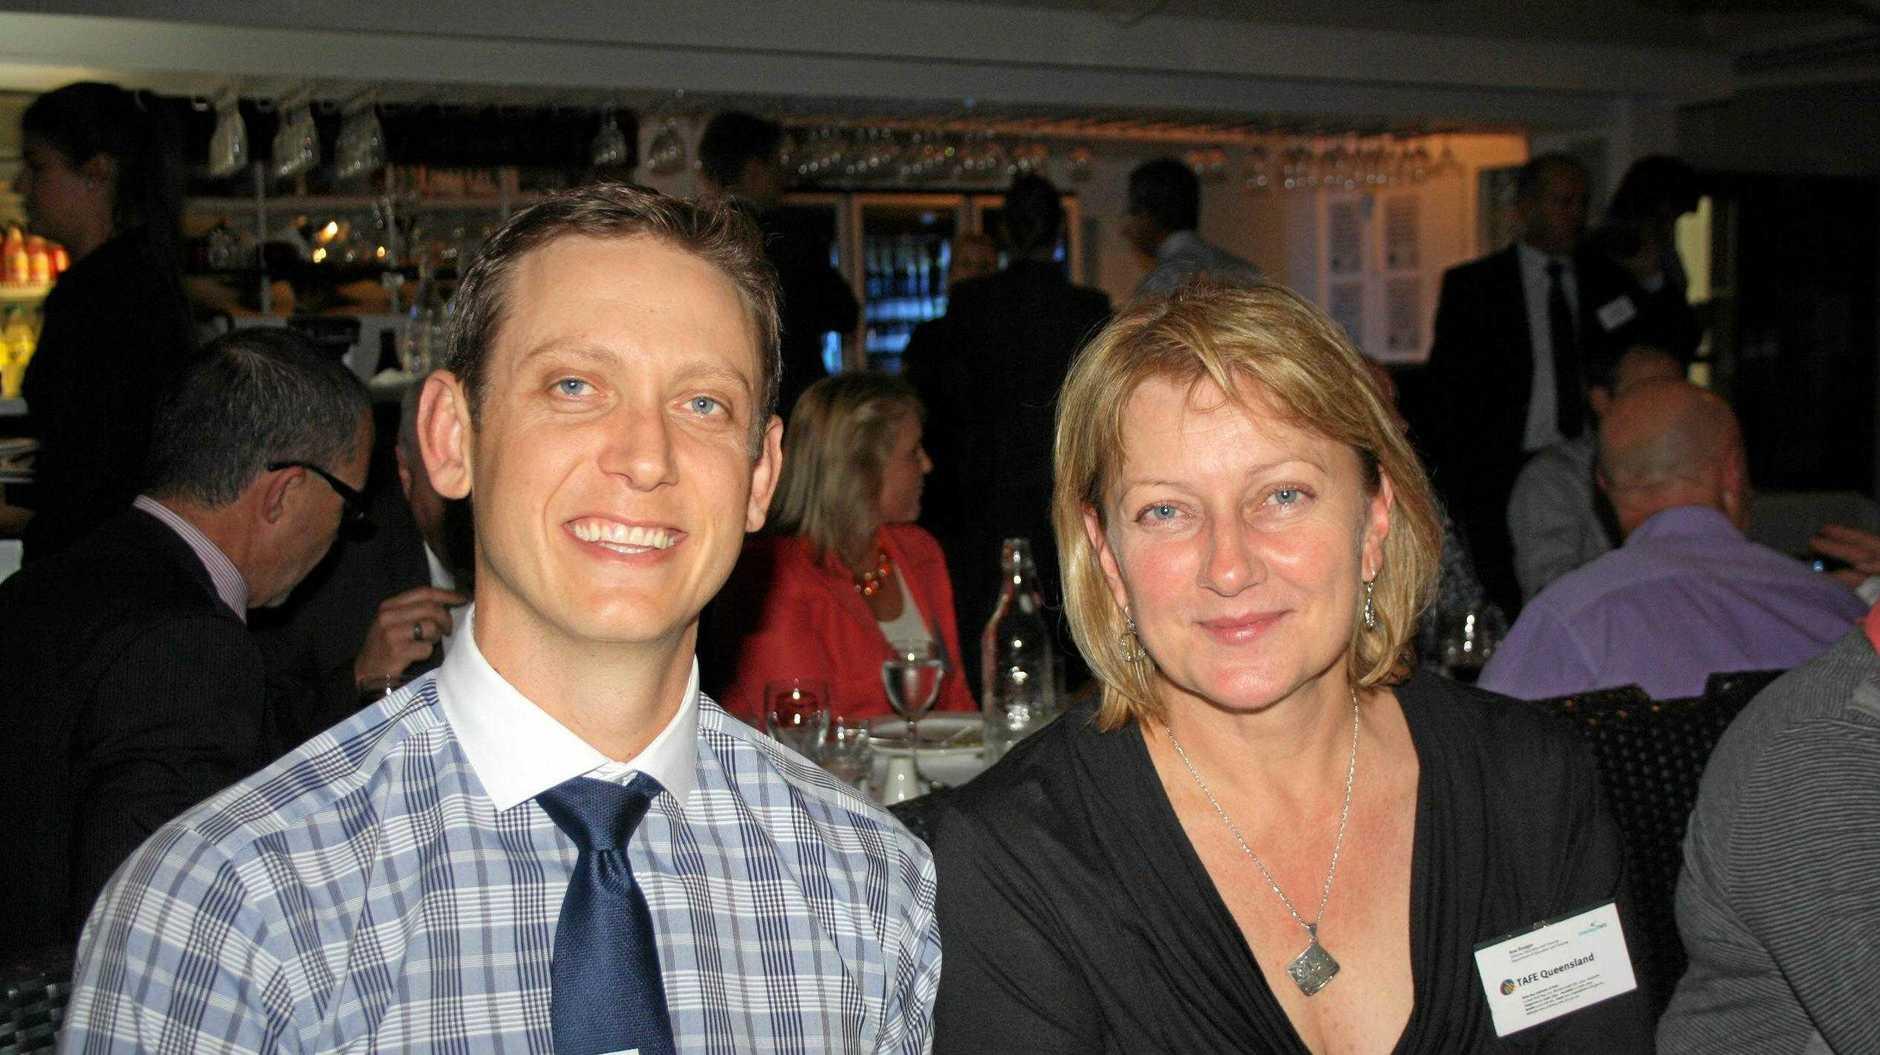 John Cranley of Southern Cross Austereo and Ana Rodger of TAFE